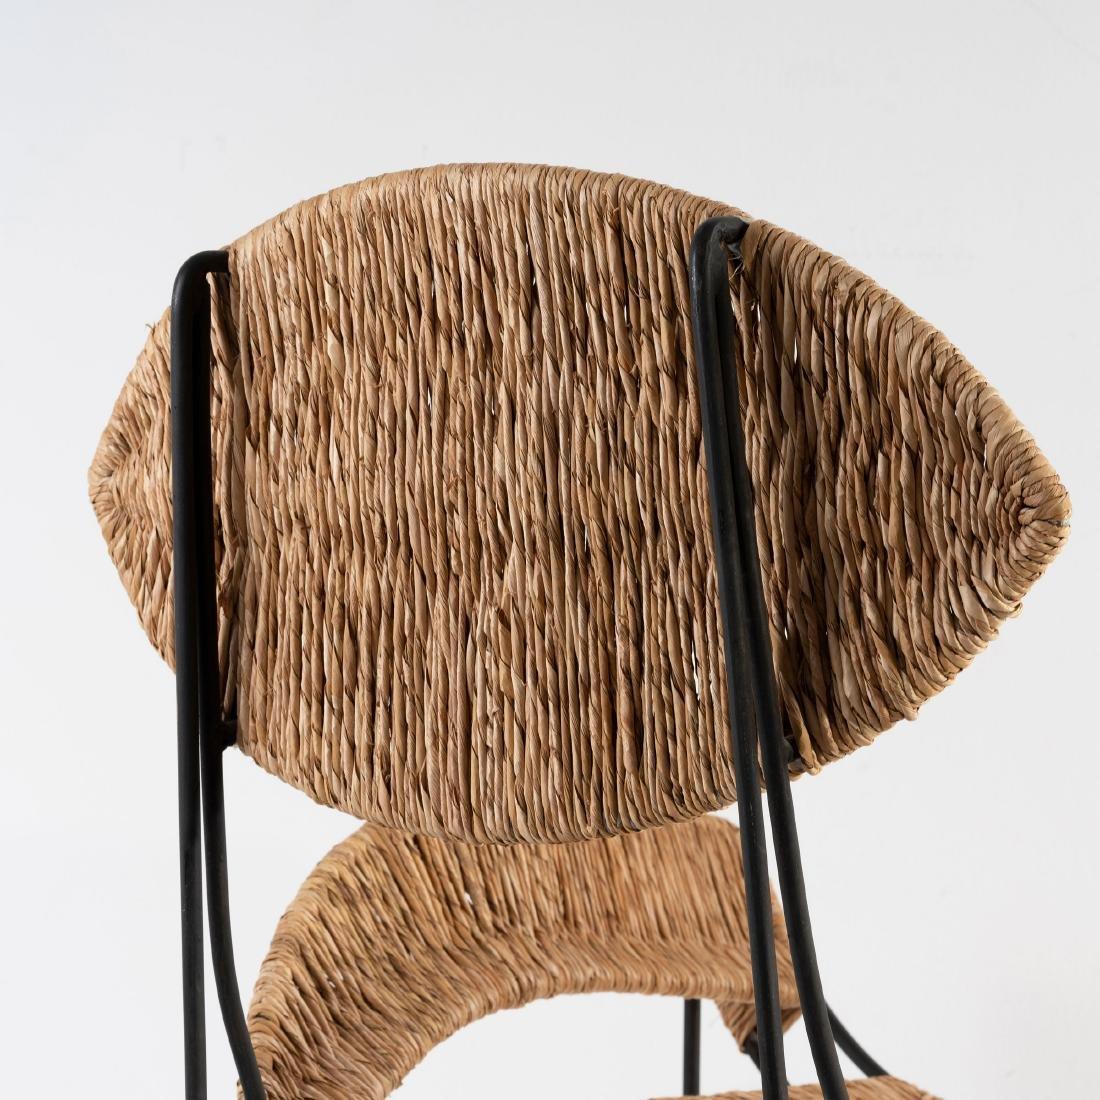 'Banana chair', 1988 - 7